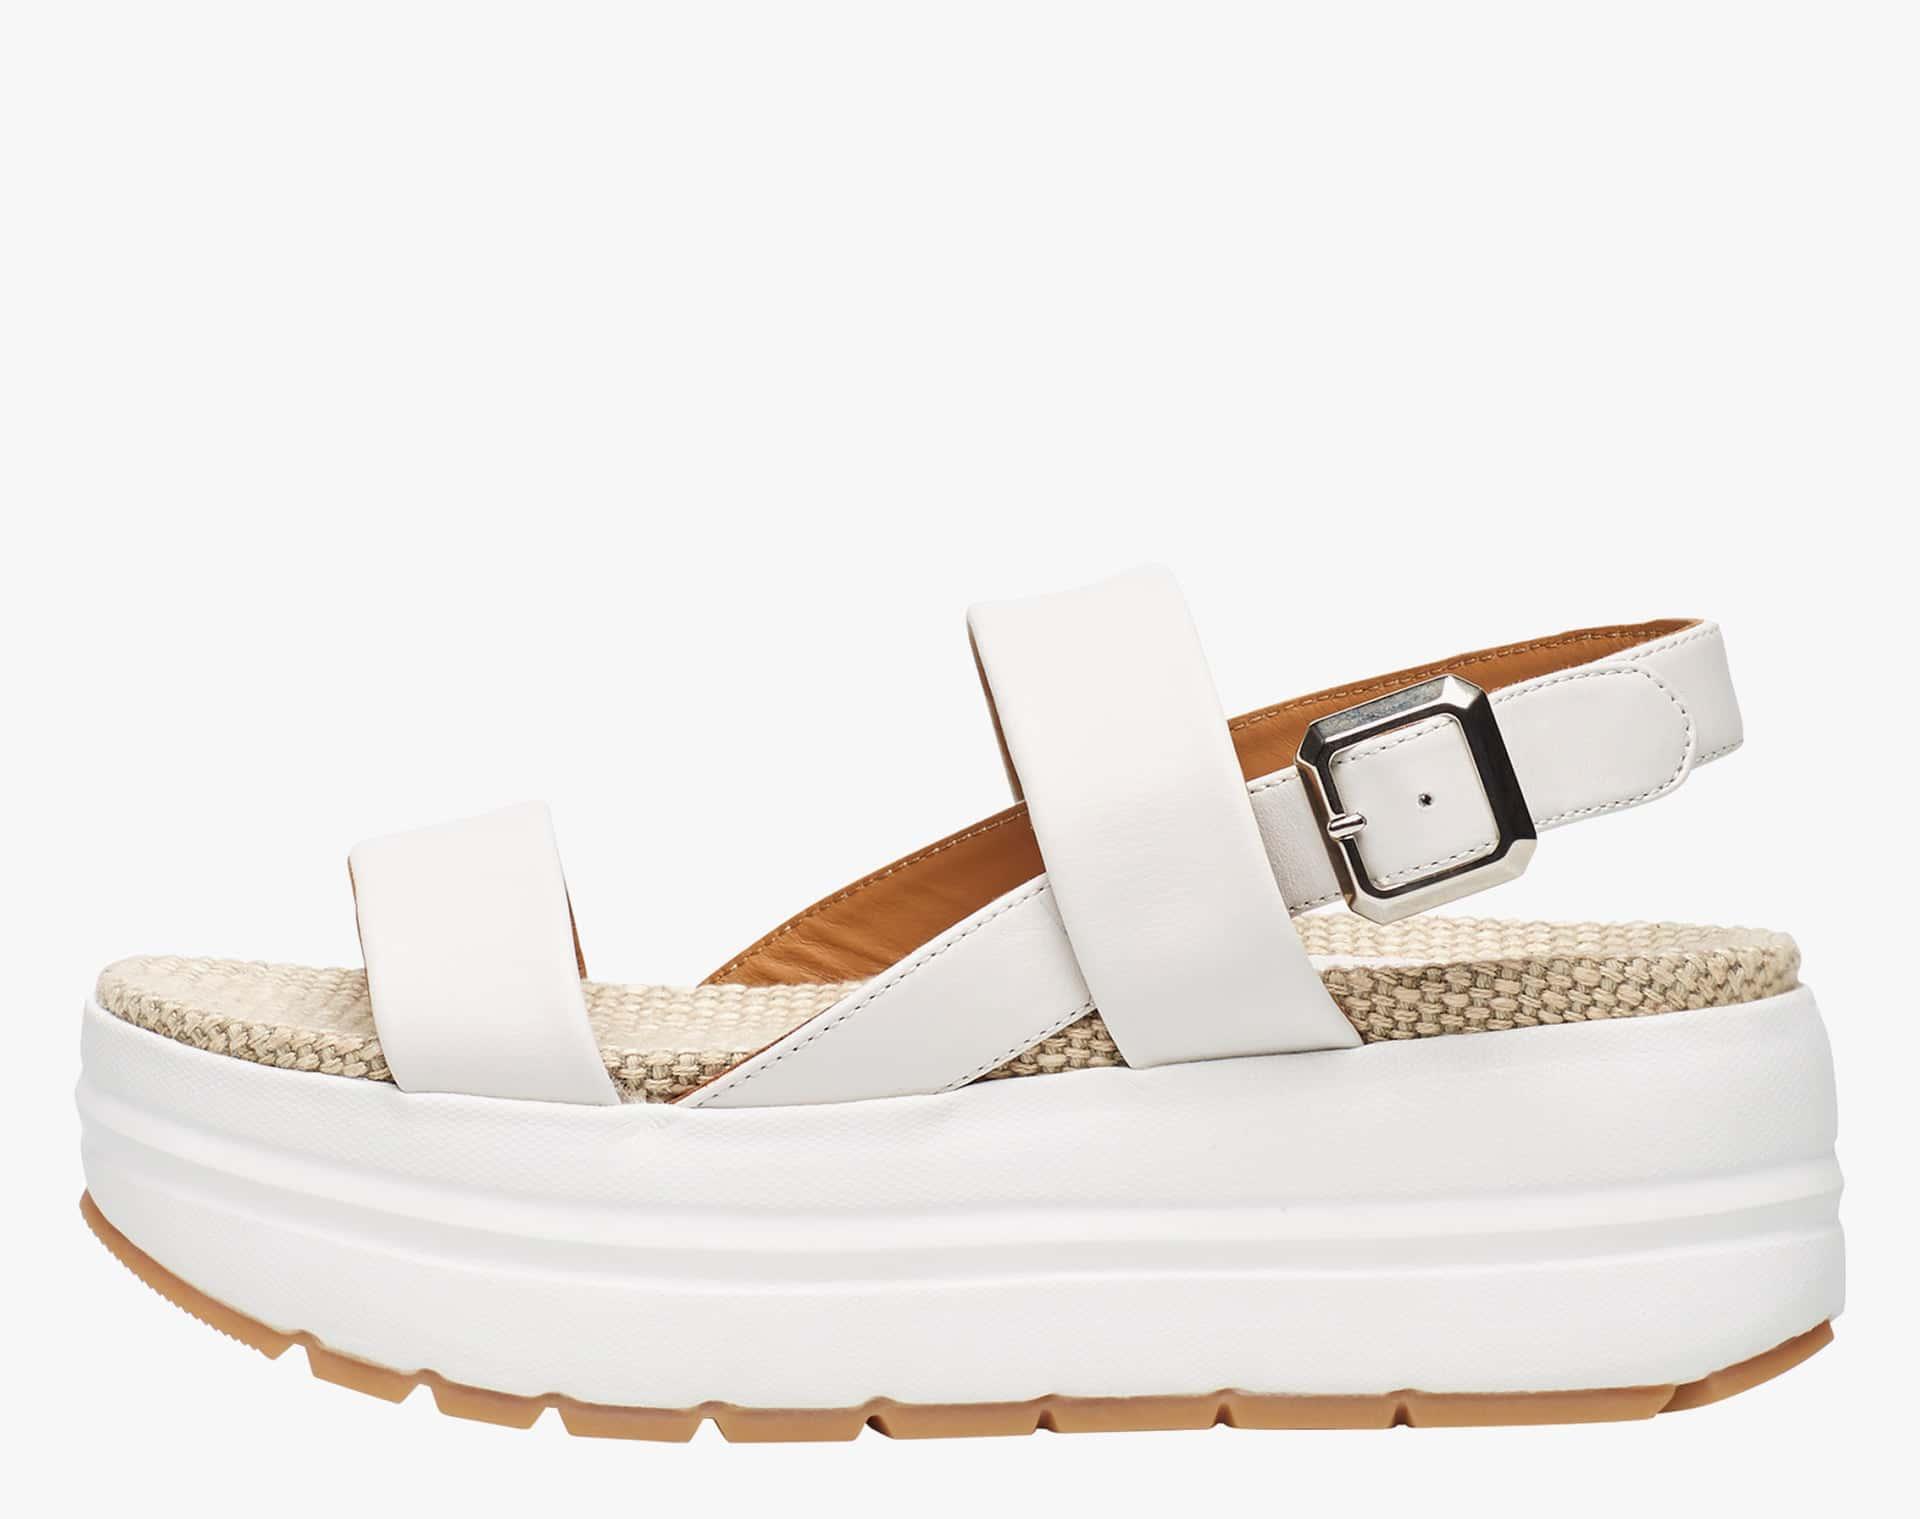 SULA EASY - Calfskin sandal with raffia insole - White